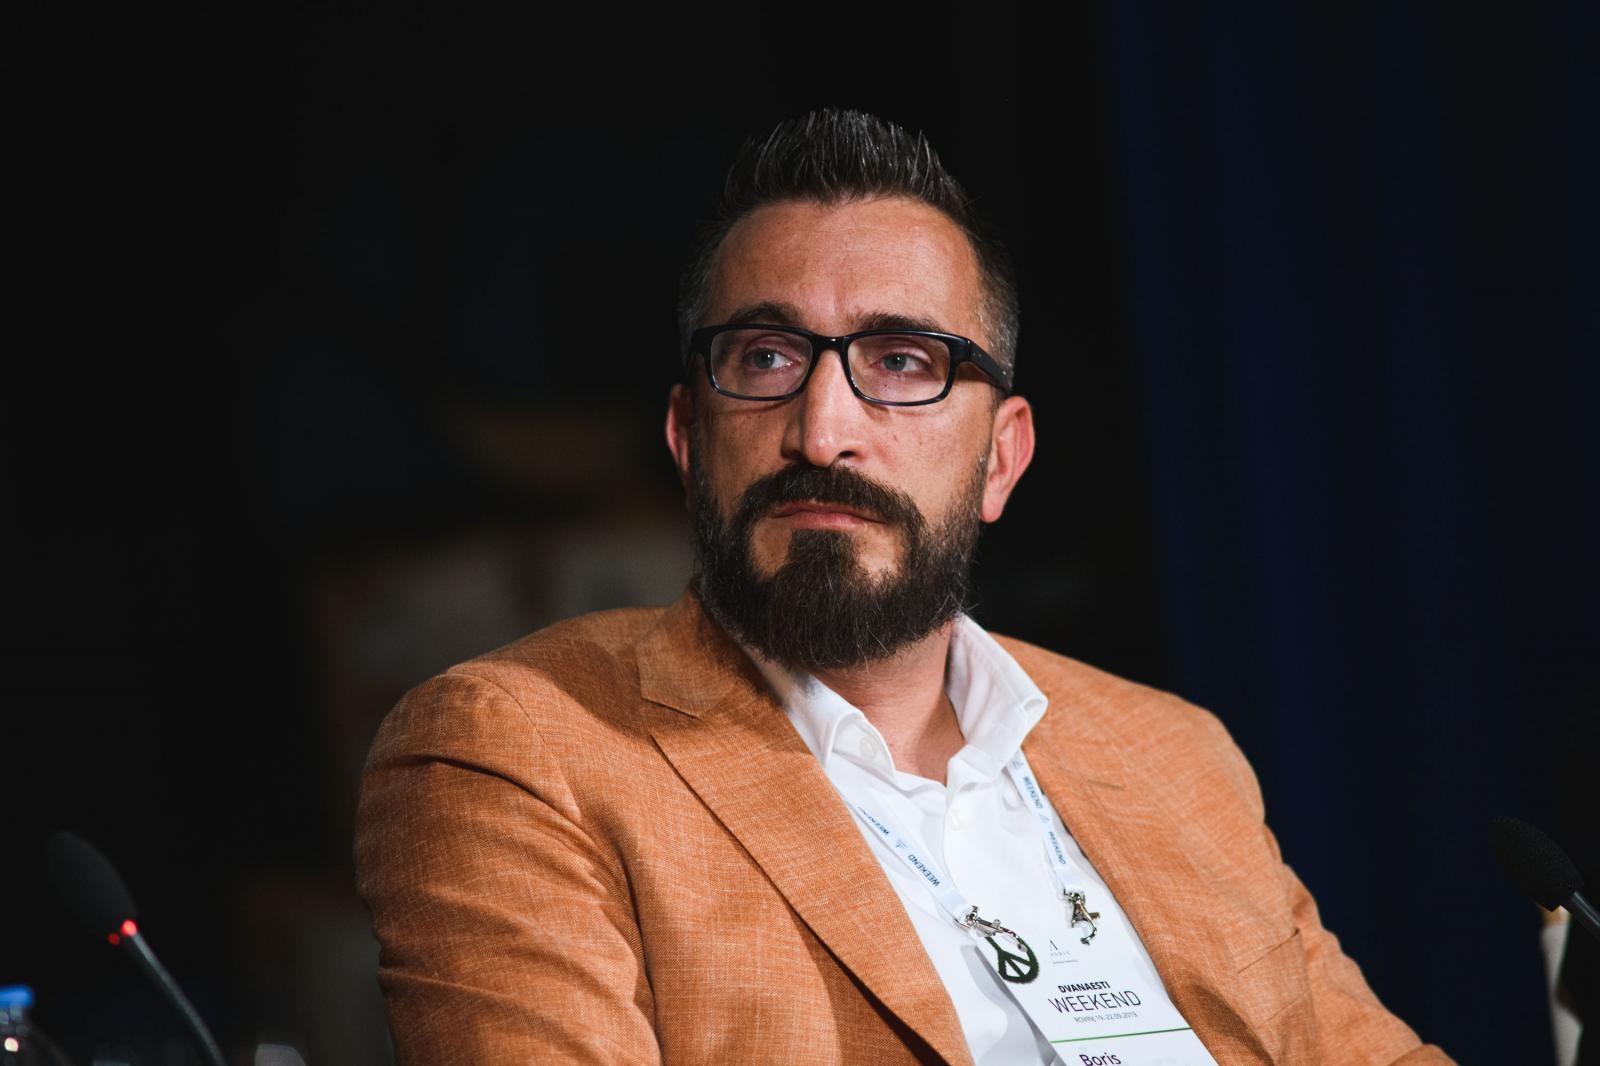 21.09.2019., Rovinj - Weekend Media festival, Kako ce zuckerberg & friends prezuivjeti globalni techlash. Boris Trupcevic  Photo: Marko Dimic/PIXSELL